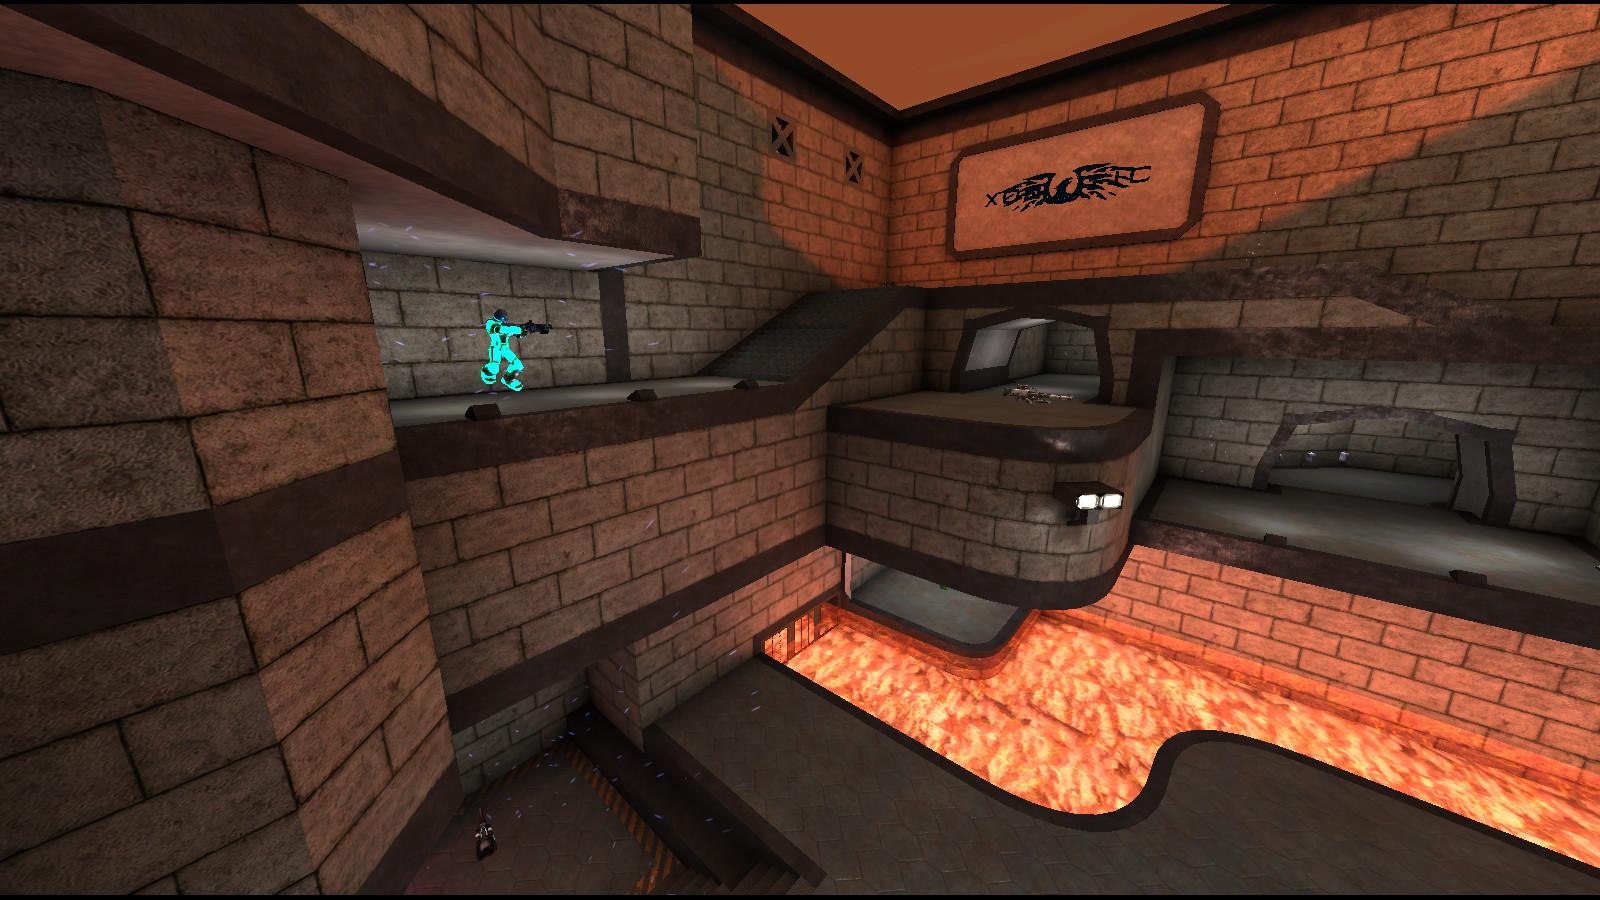 quake 3 arena torrent download